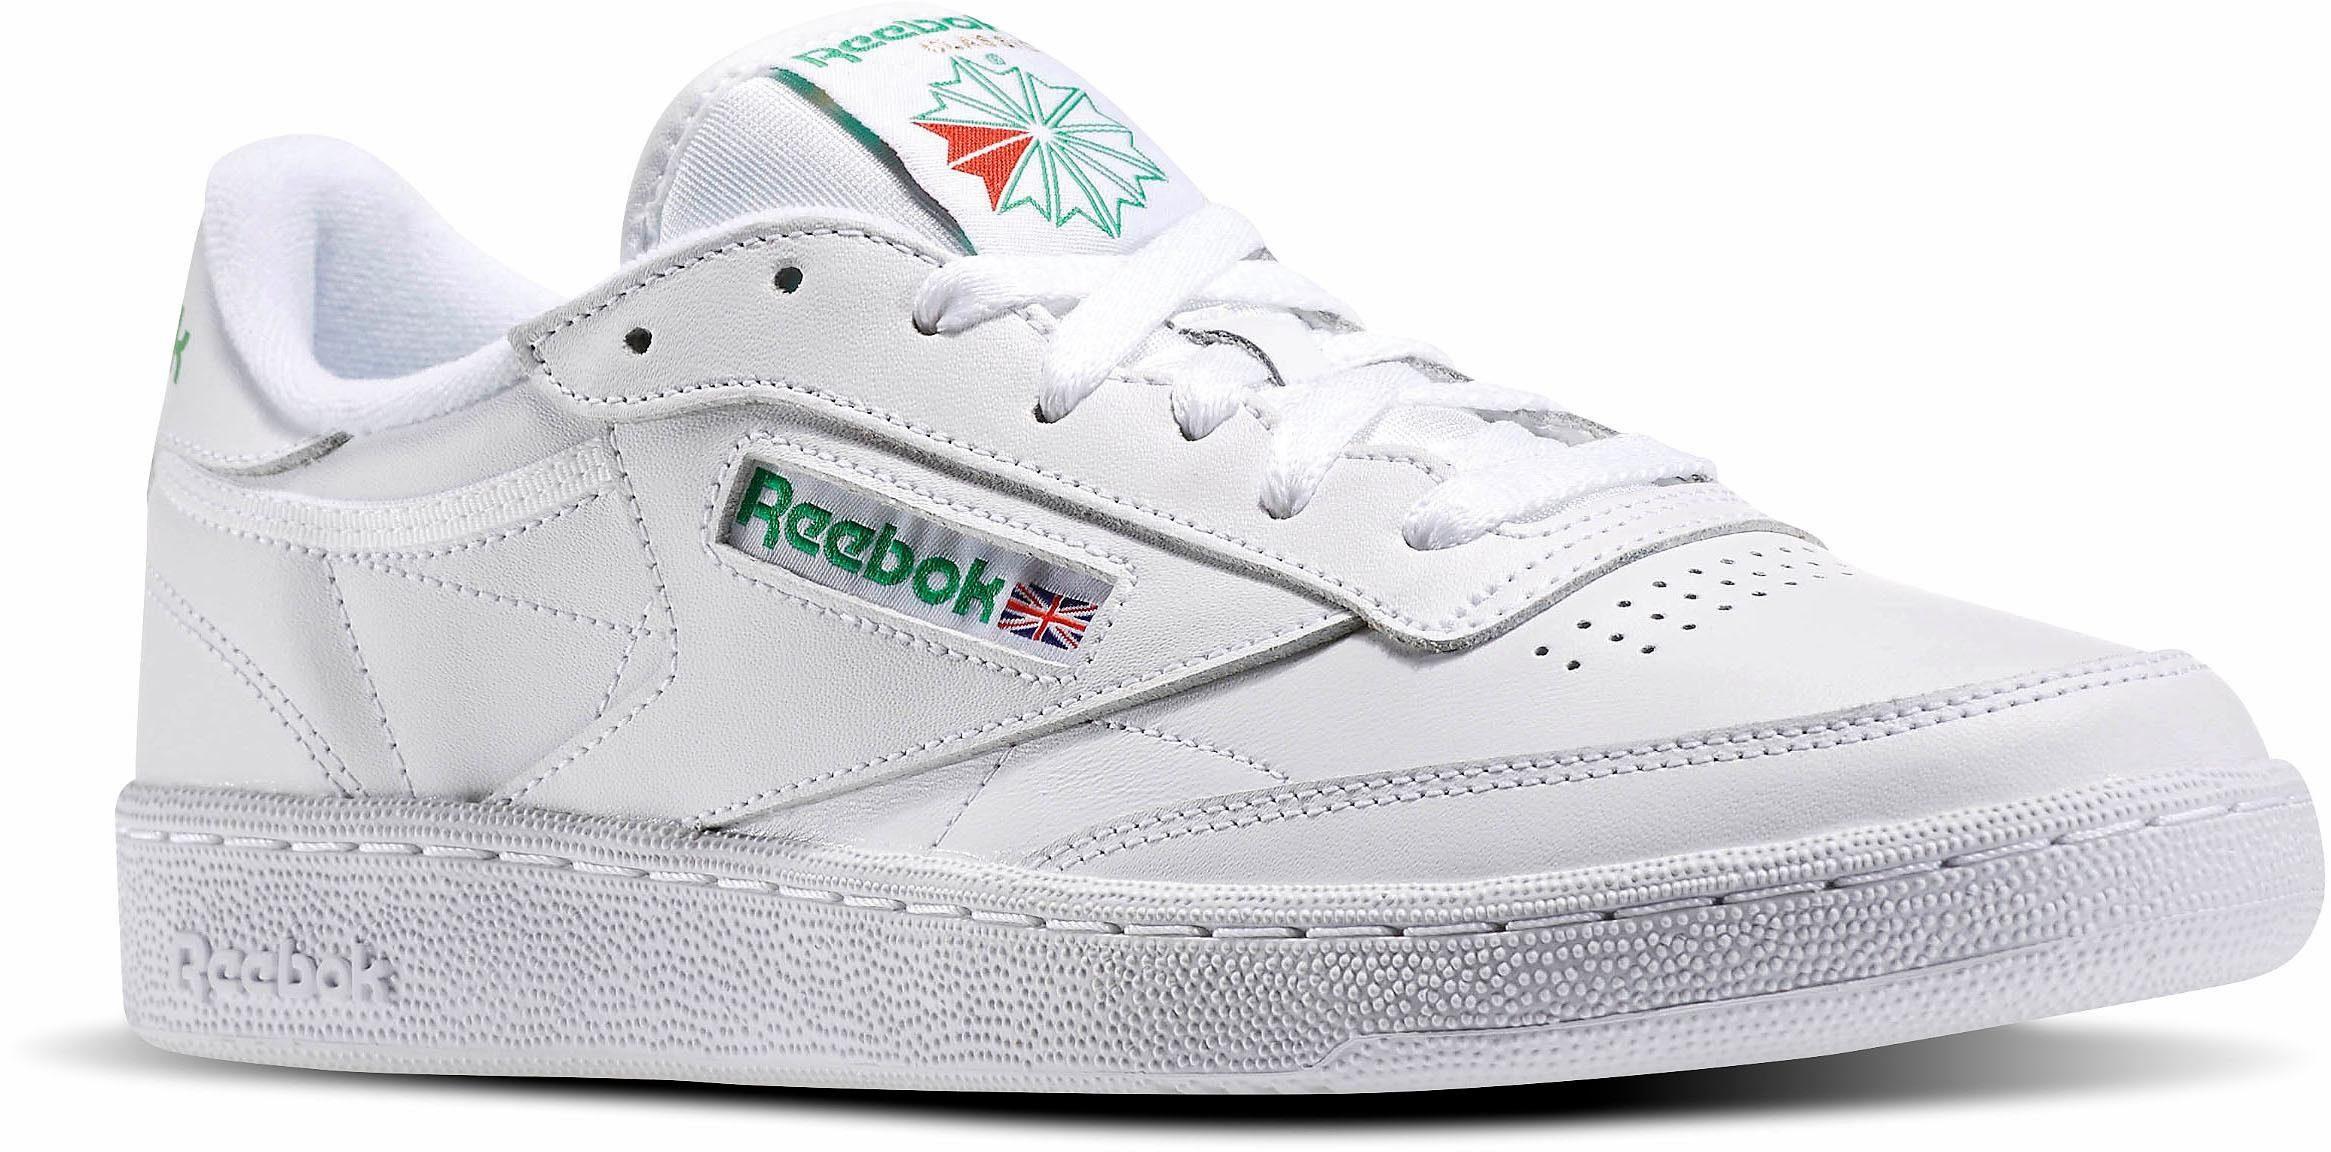 Reebok Faible Club De Chaussures De Sport Classique C 85 Hommes EL5oVKEdOe